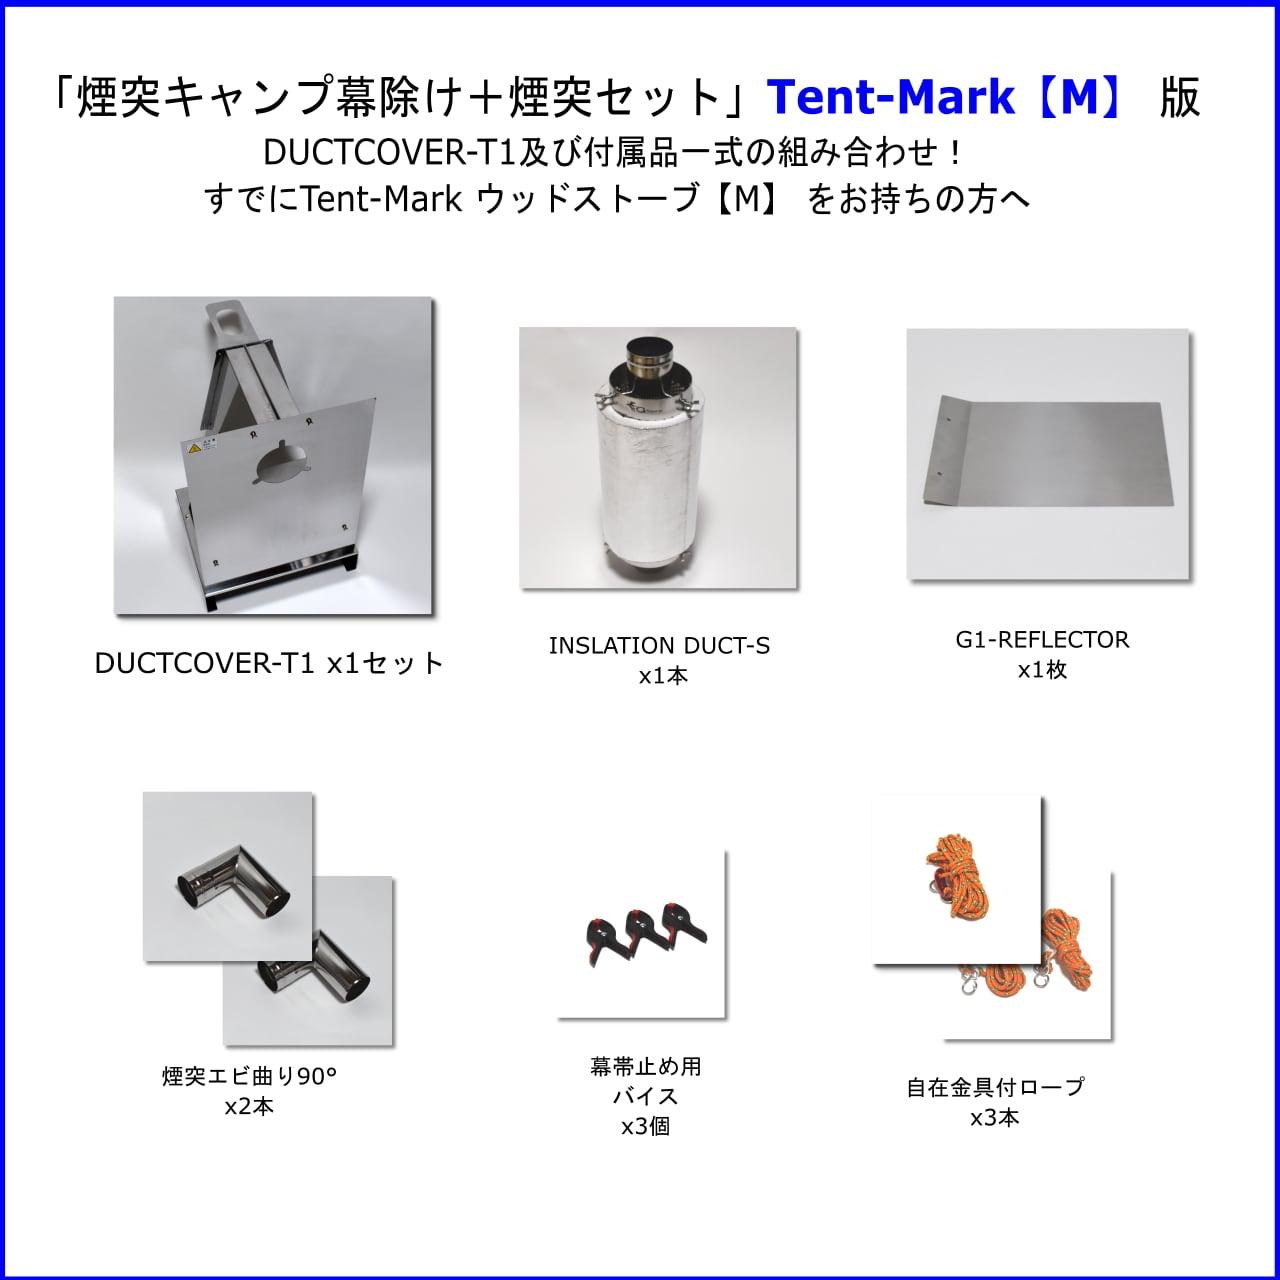 Tent-Mark WOOD STOVE【M】版「煙突キャンプ幕除け+煙突セット 」